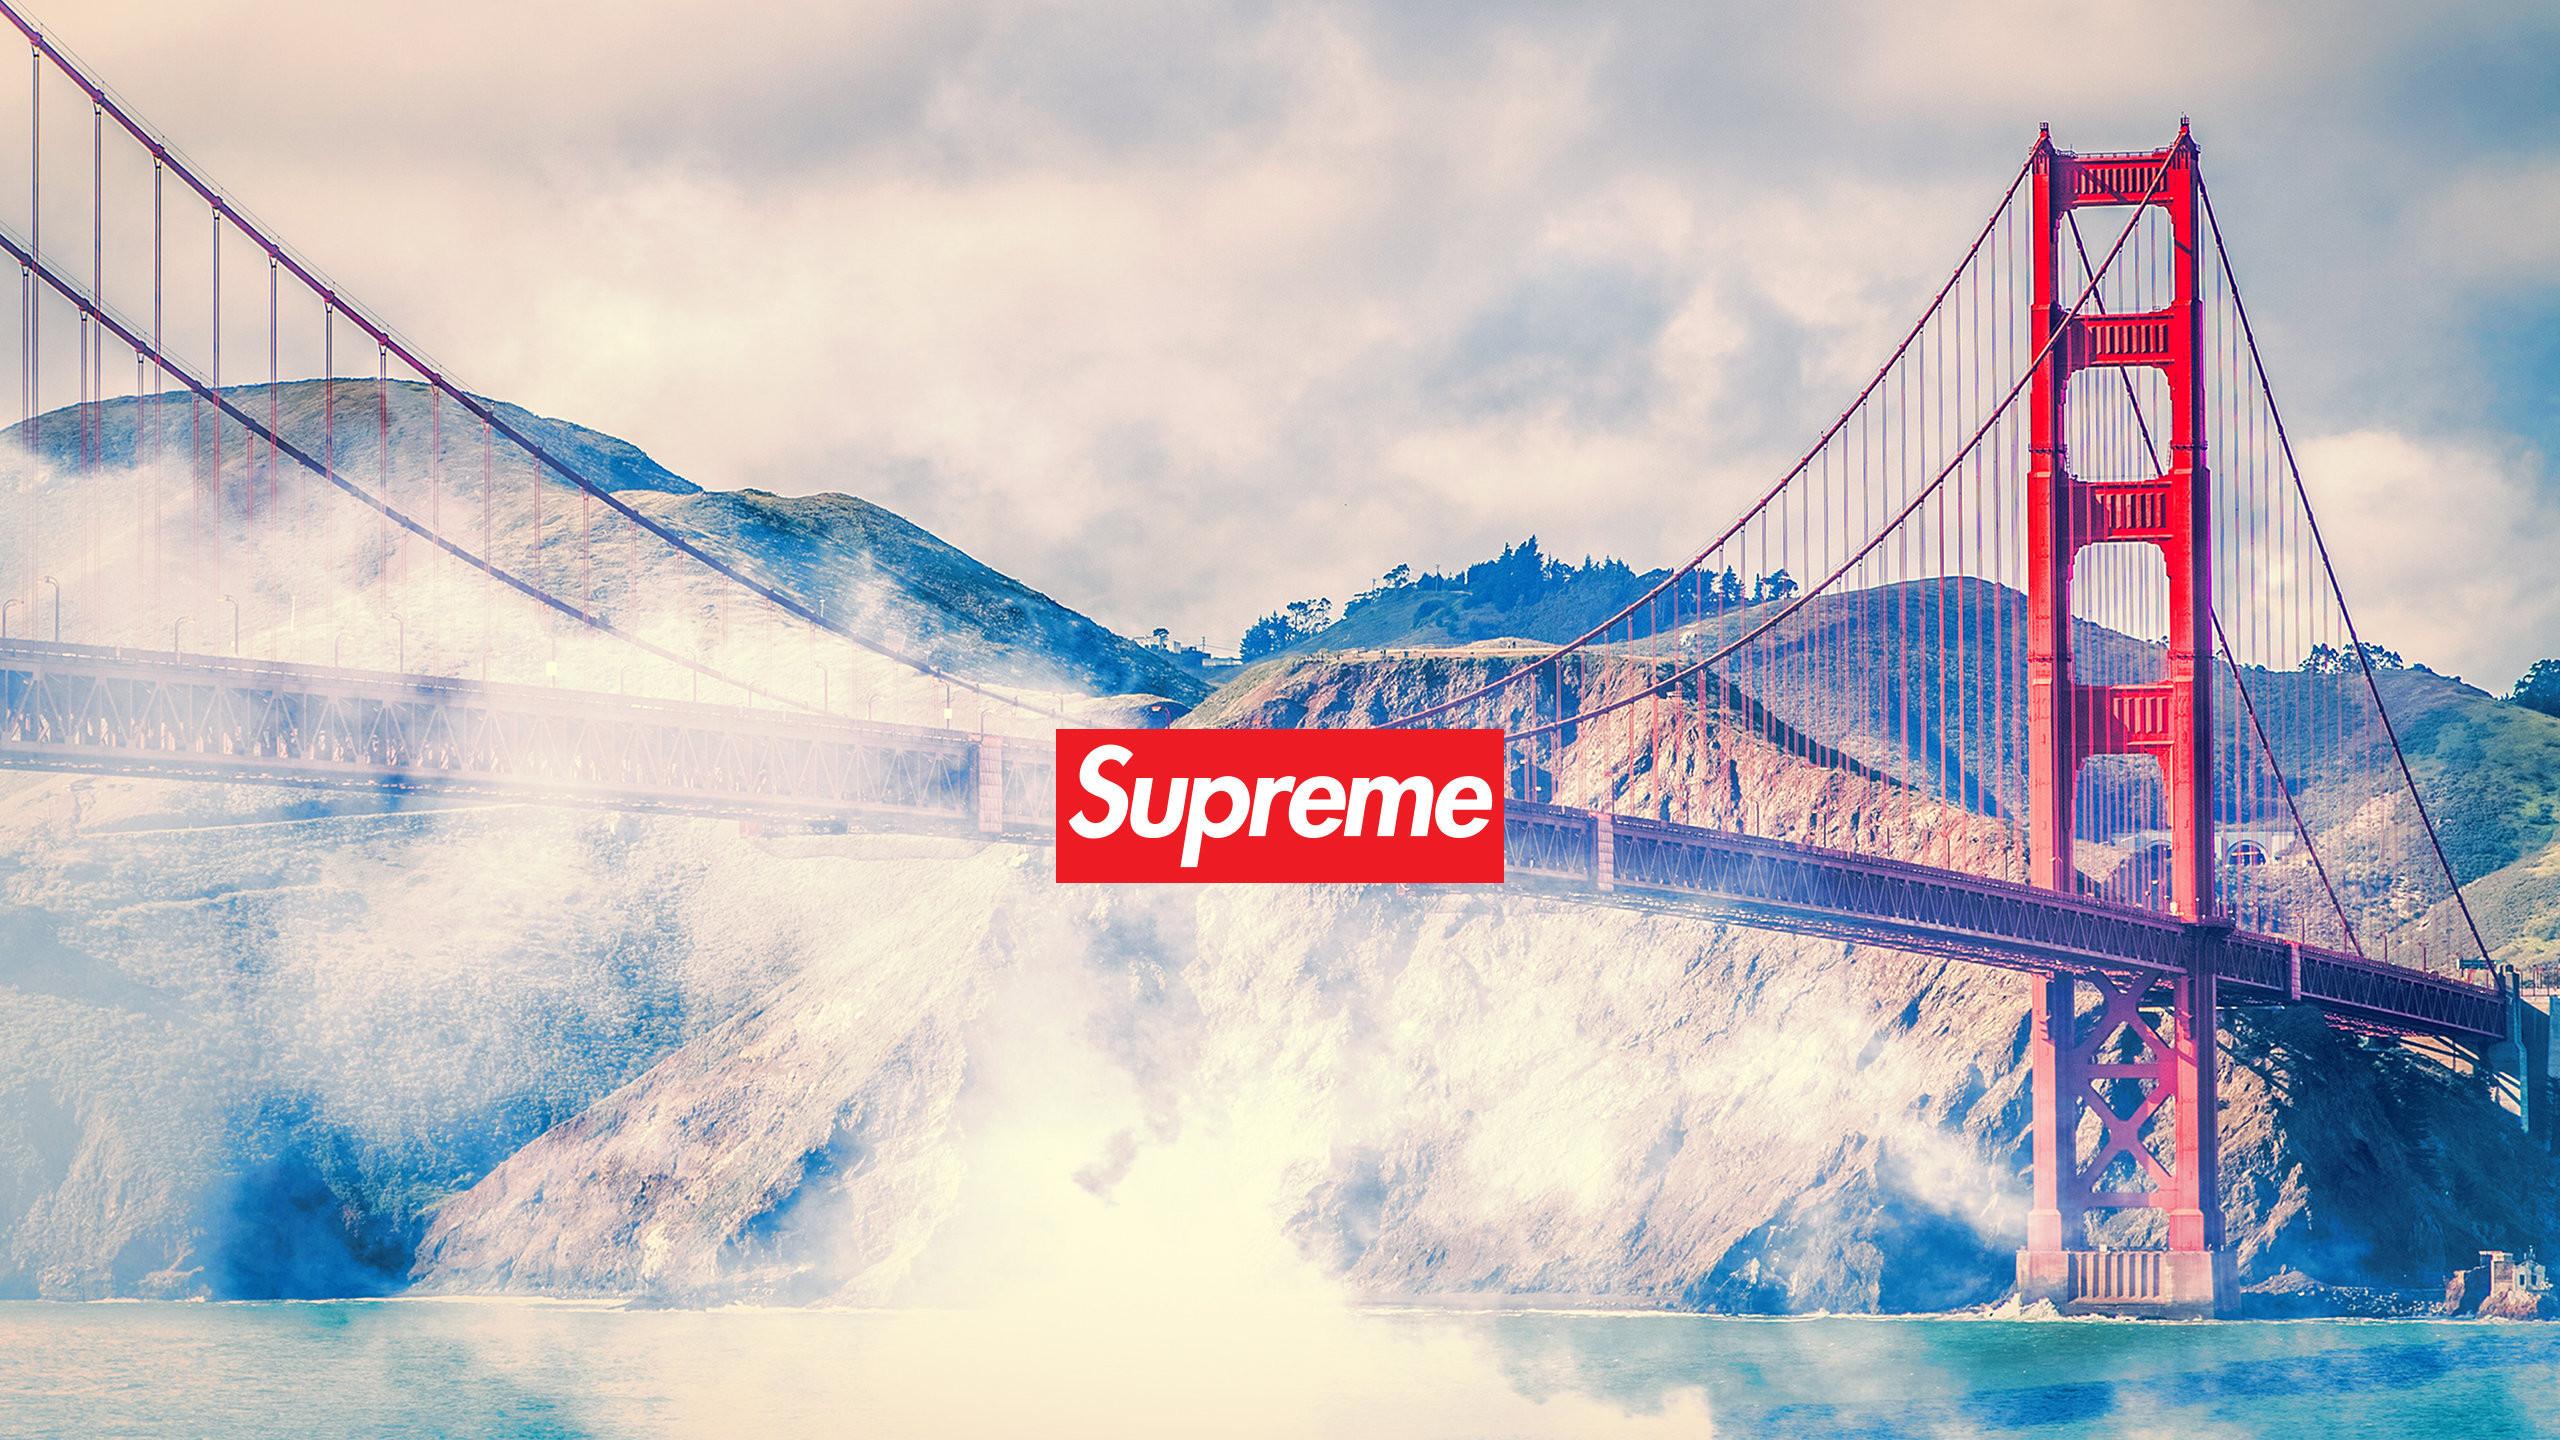 83 Supreme Wallpapers on WallpaperPlay 2560x1440